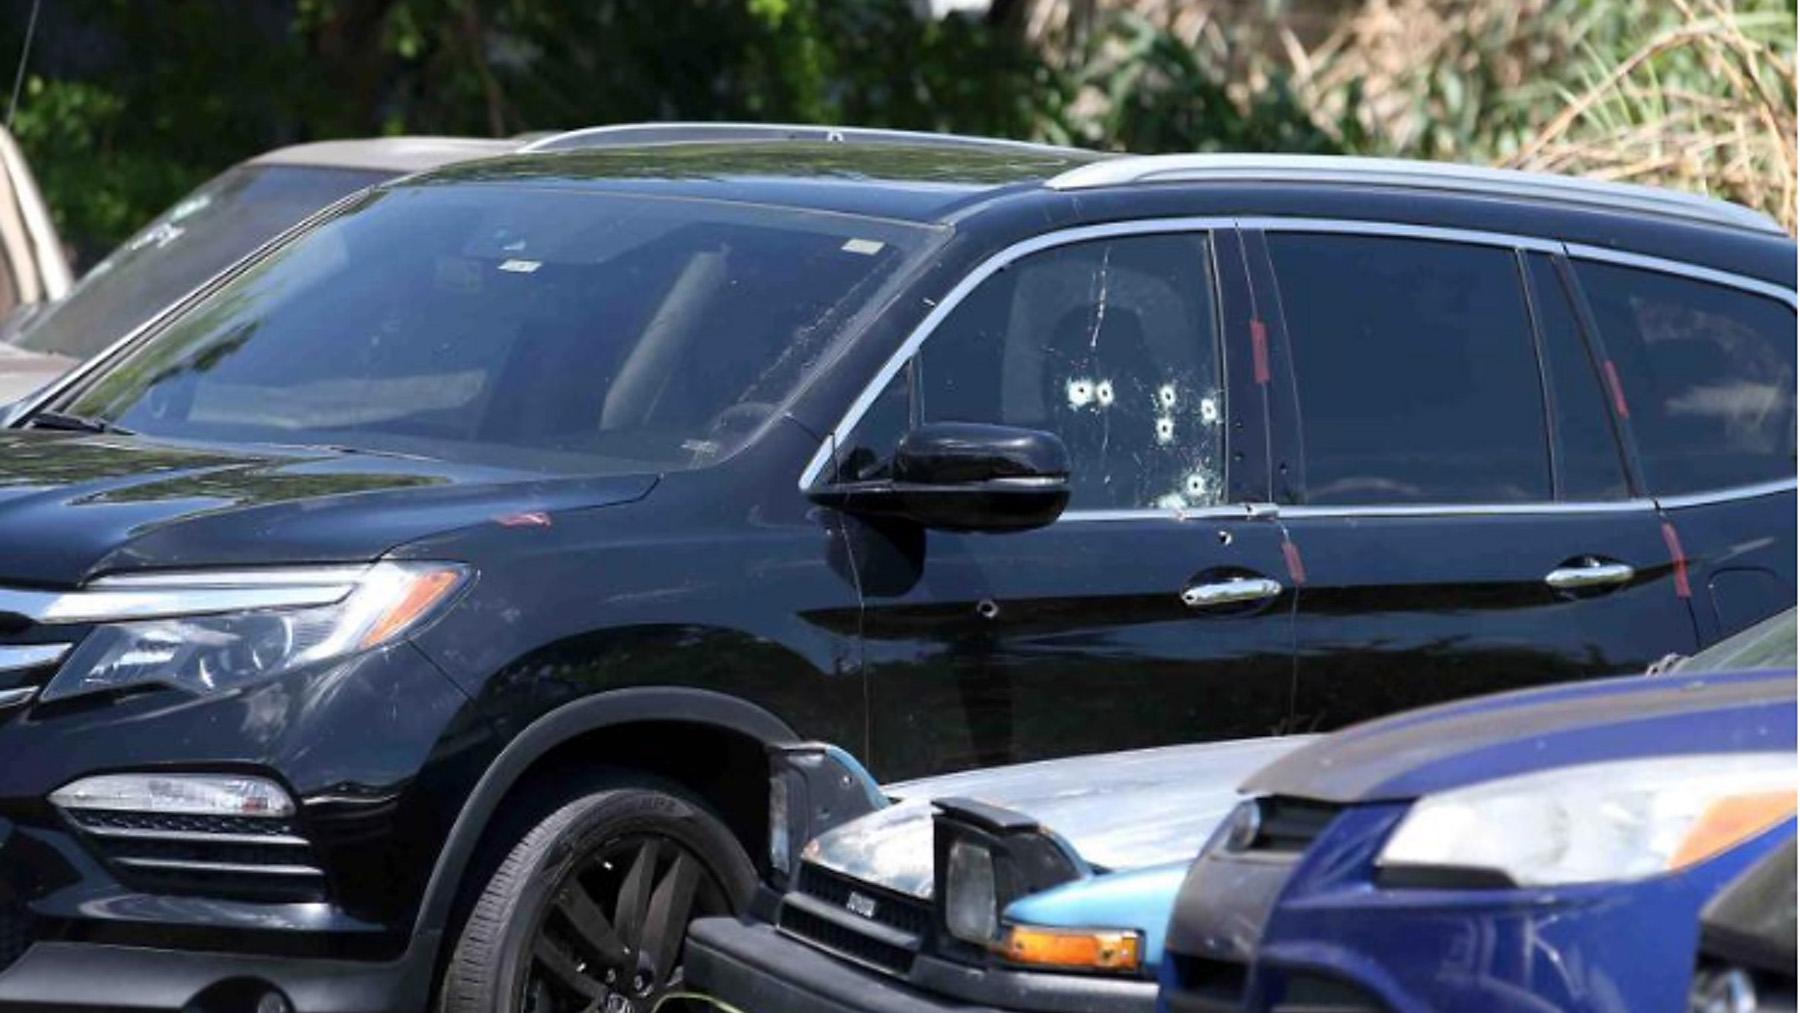 Revelan detalles sobre el asesinato de la empresaria Hilda Padilla